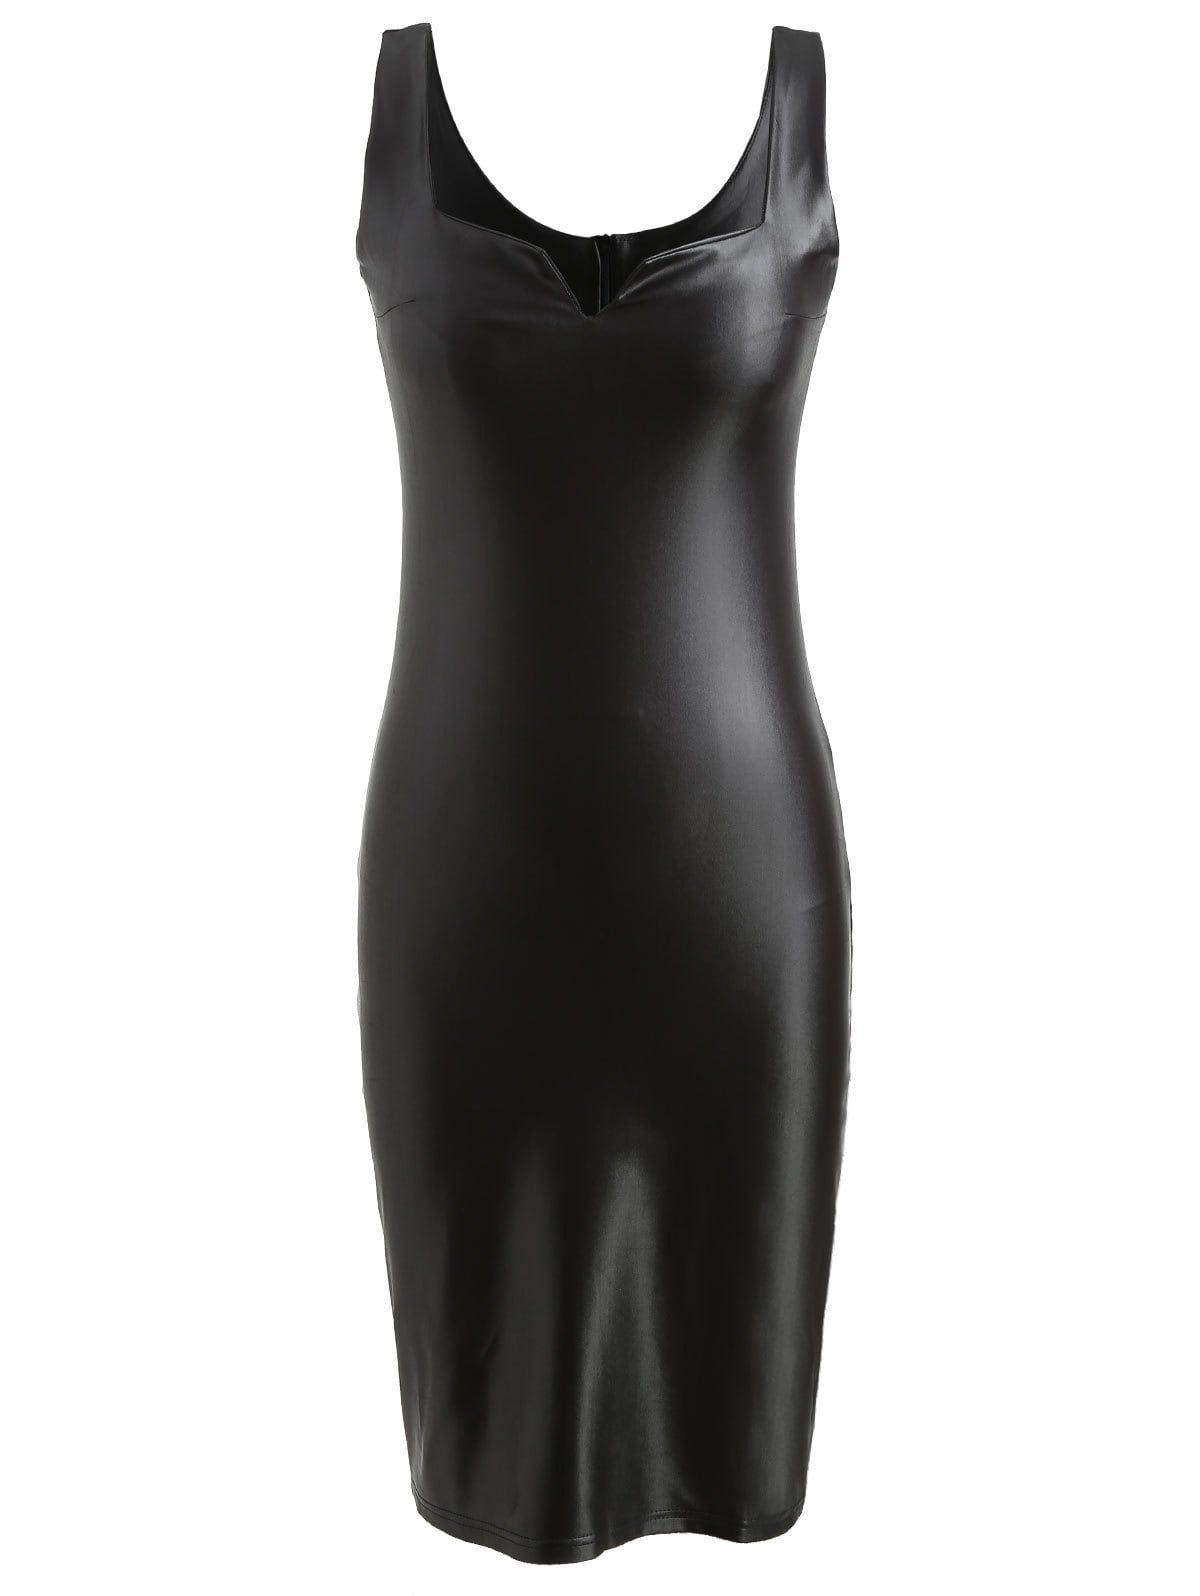 Faux Leather Bodycon Midi Dress Midi Dress Bodycon Bodycon Dress Casual Dresses For Teens [ 1596 x 1200 Pixel ]